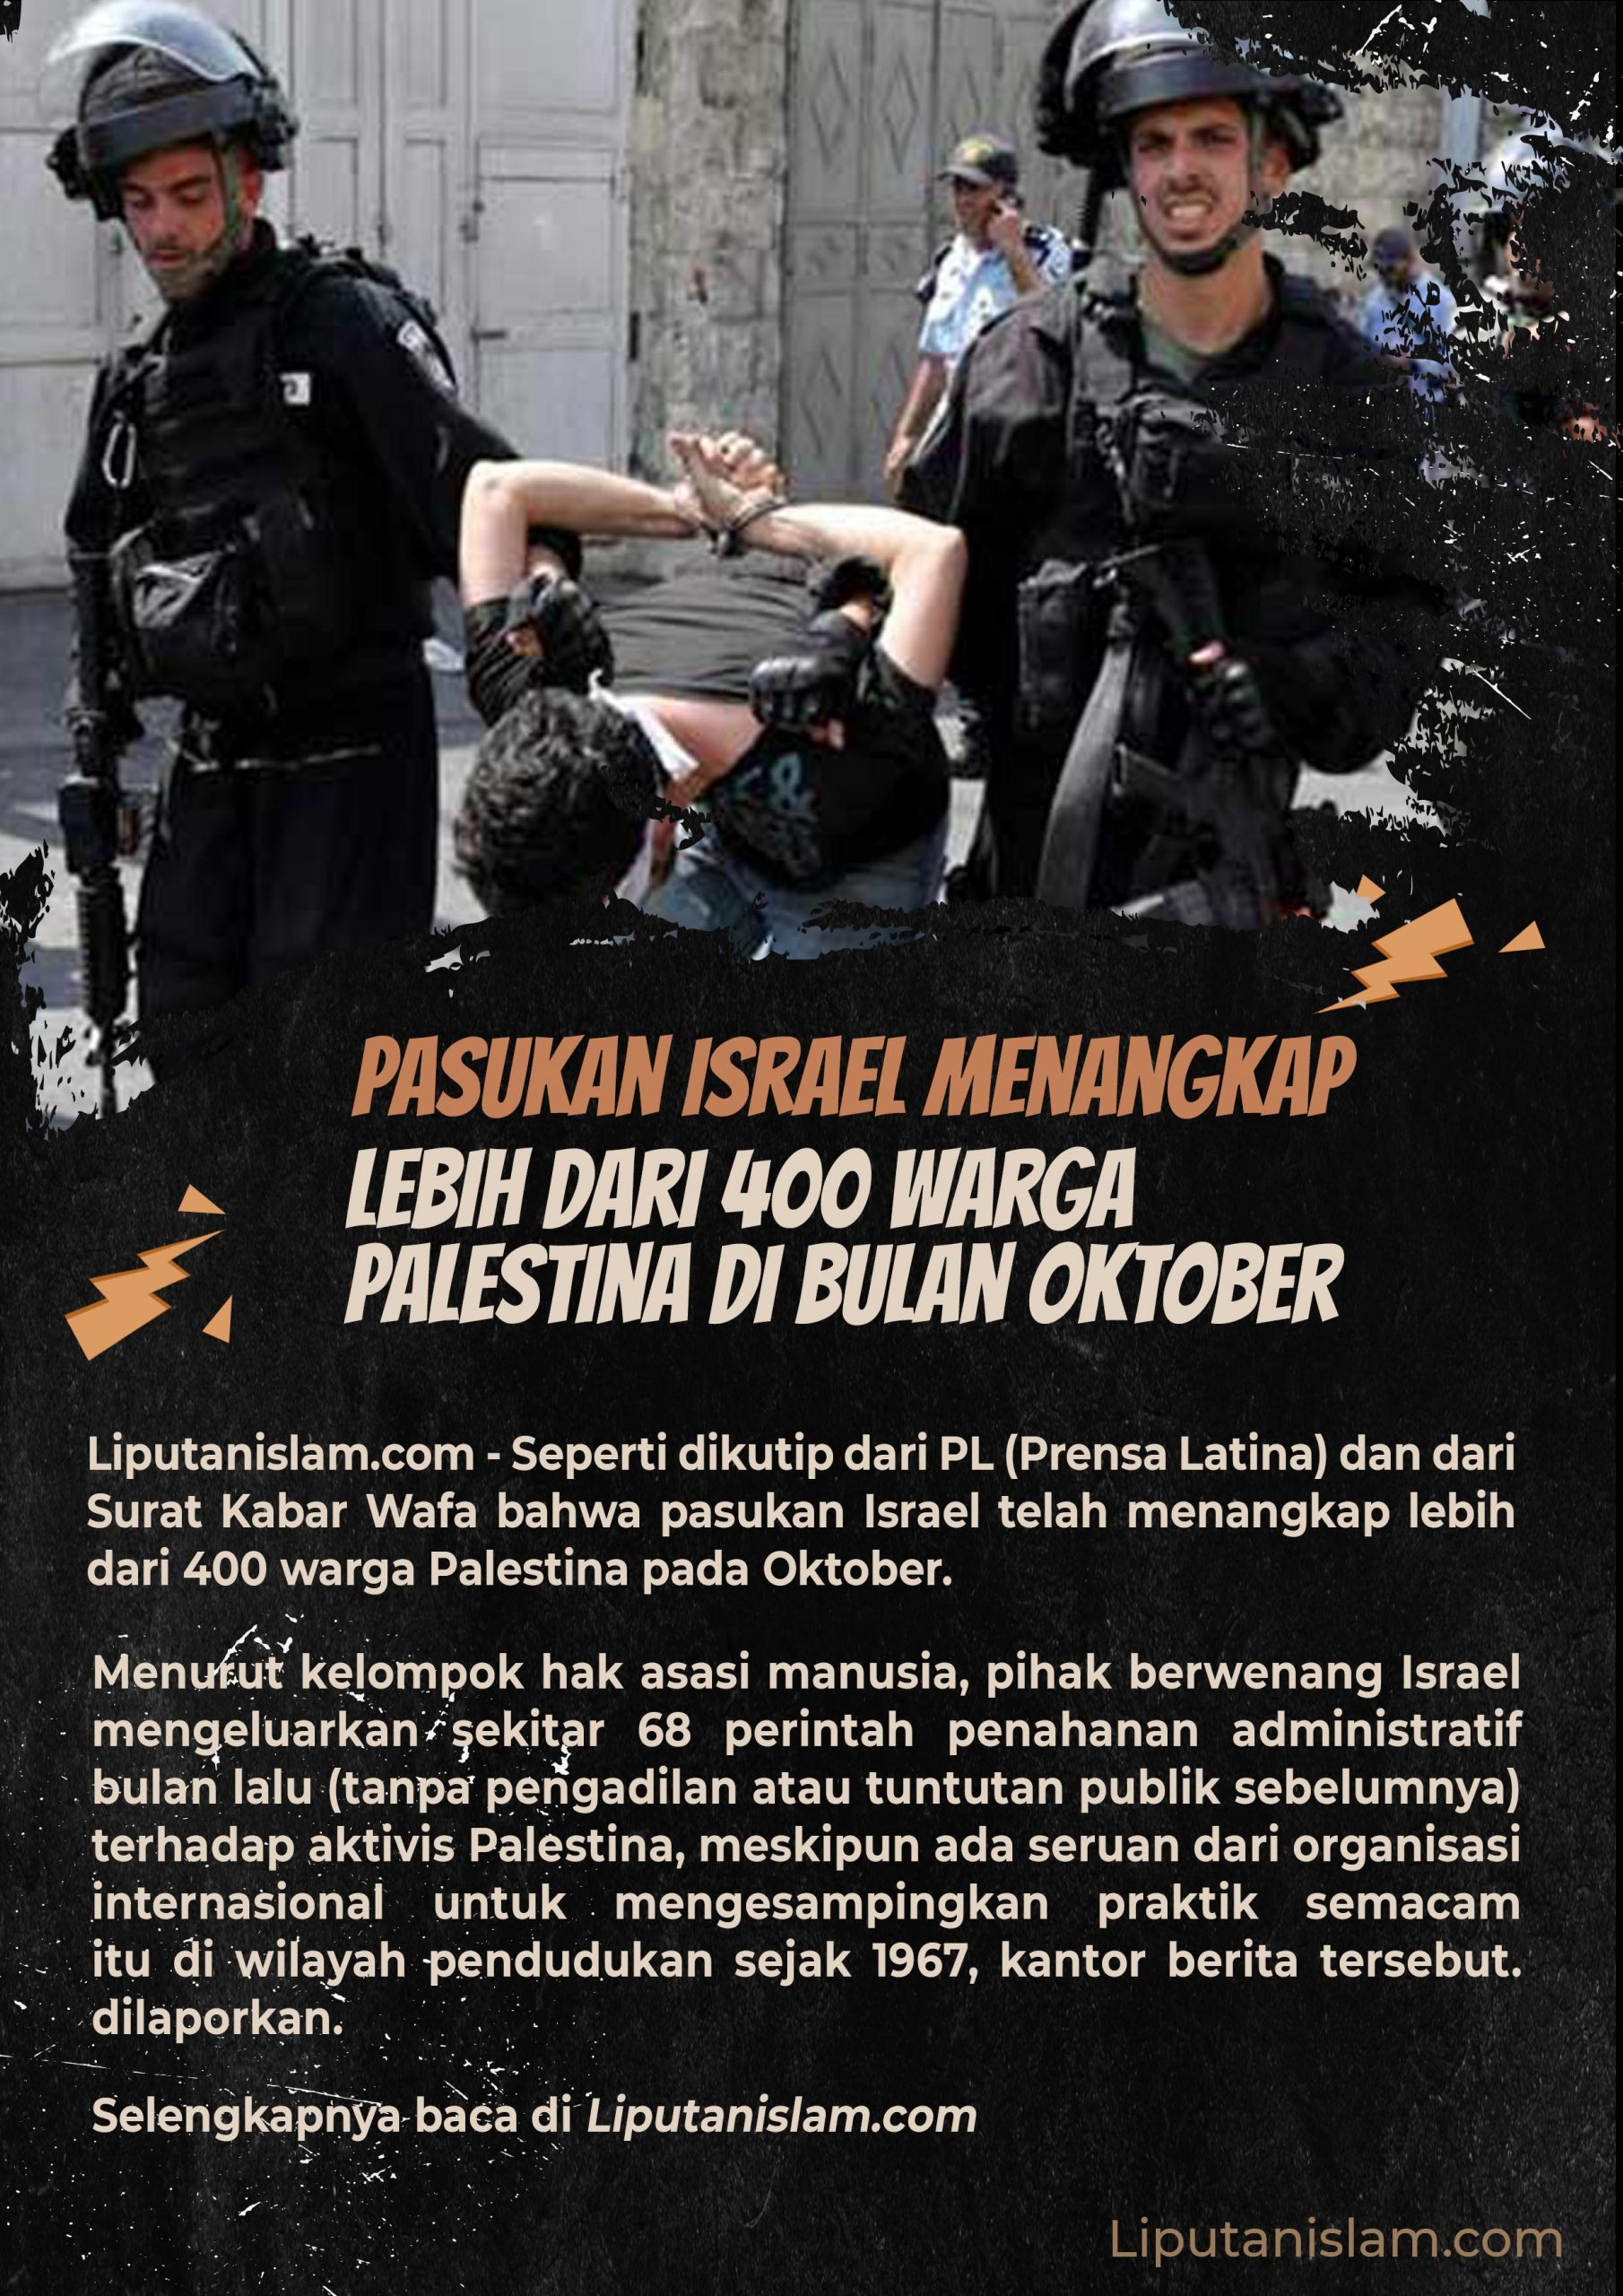 Berita Gambar Pasukan Israel Menangkap Lebih dari 400 ...